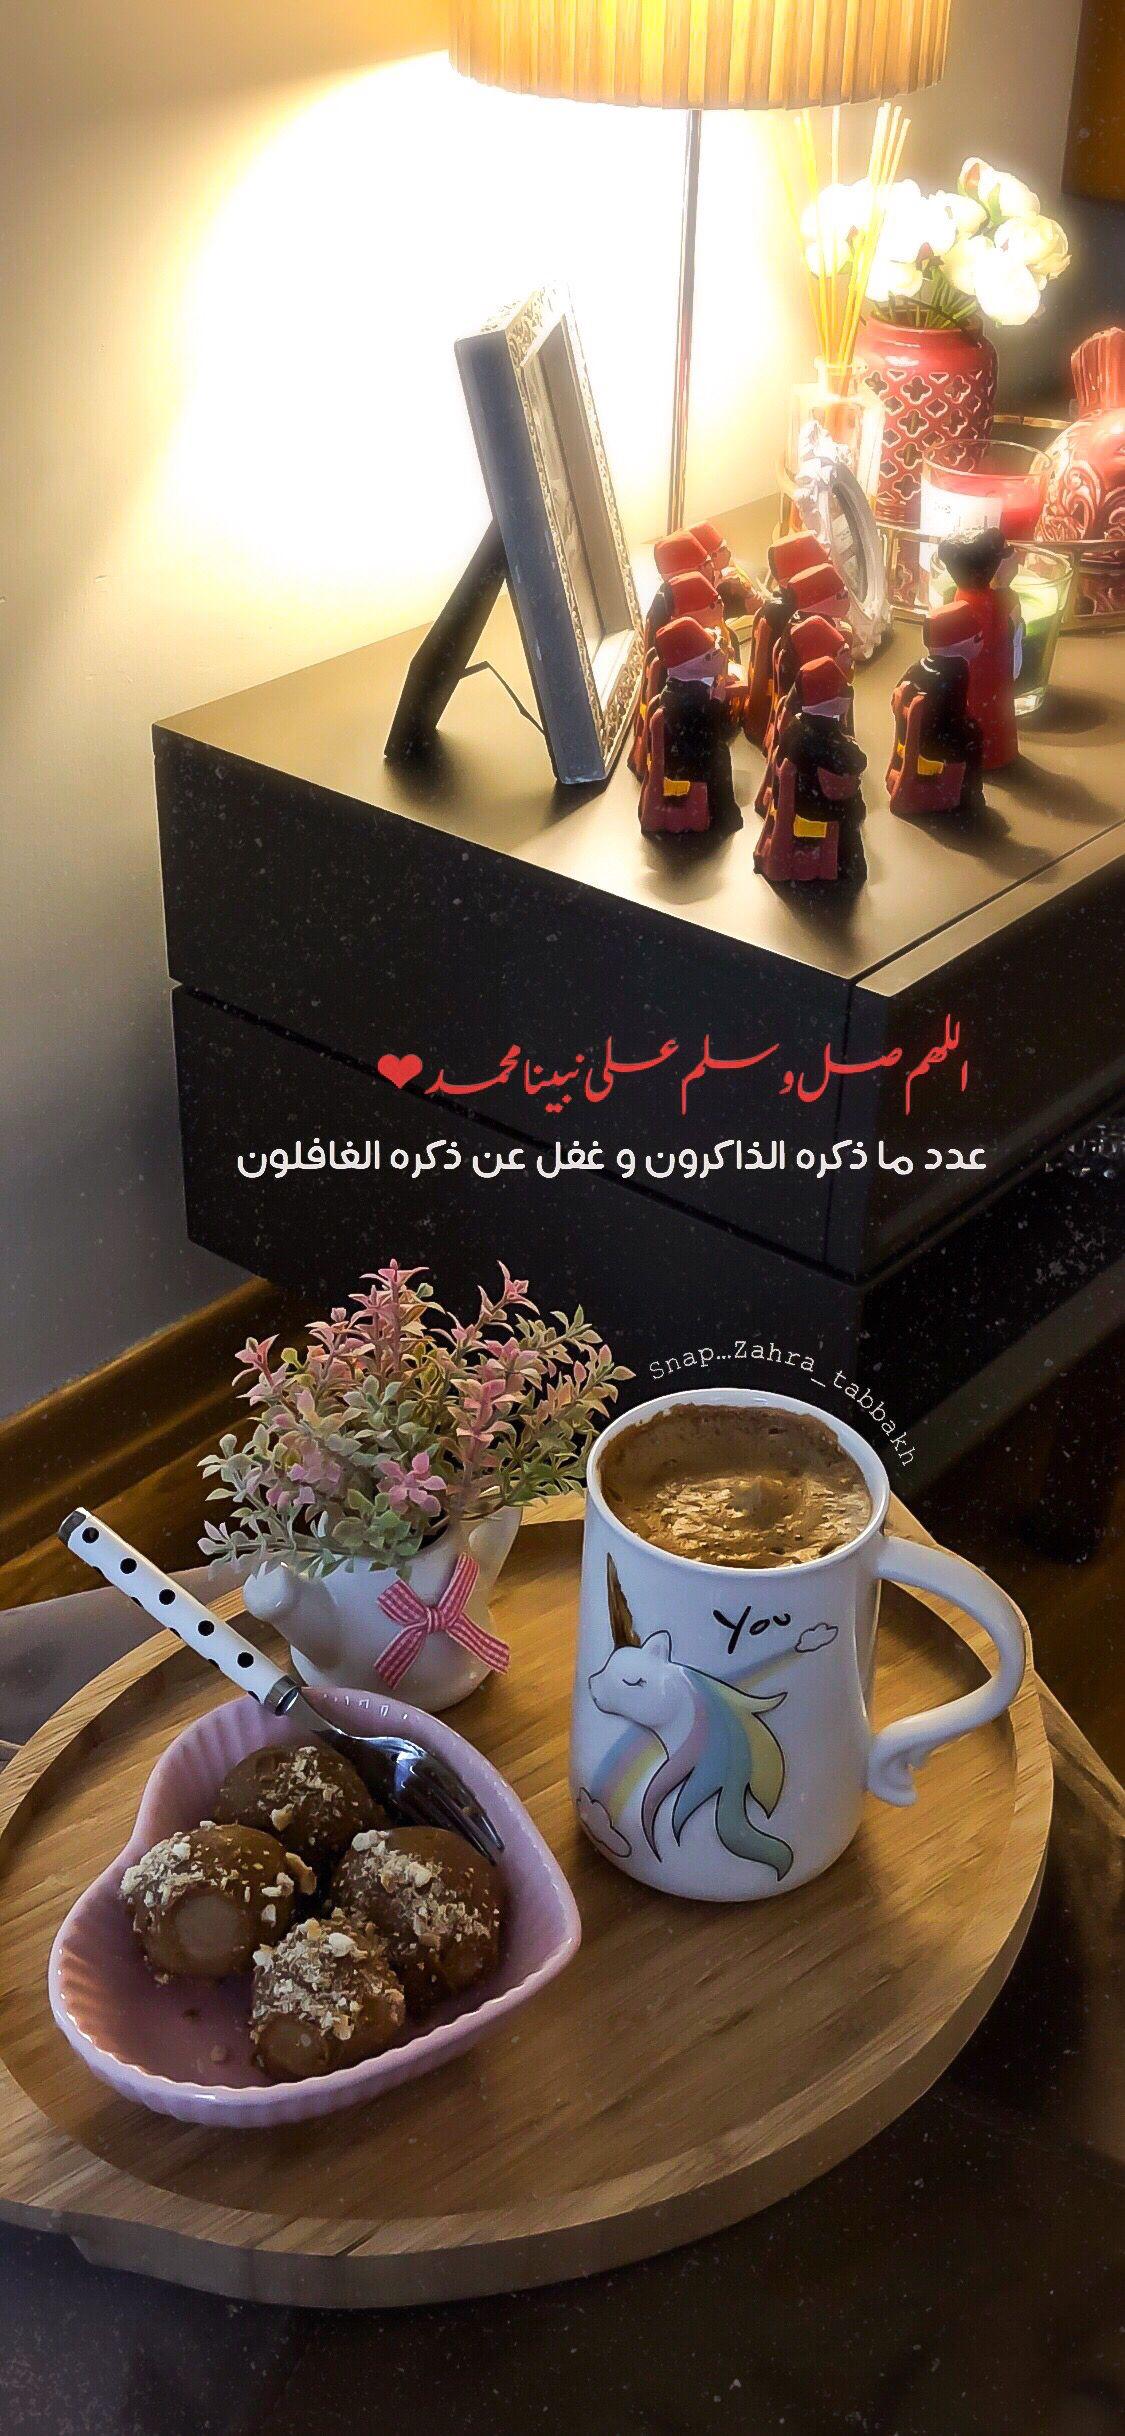 اللهم صل على نبينا محمد Coffee Shop Decor Coffee Chocolate